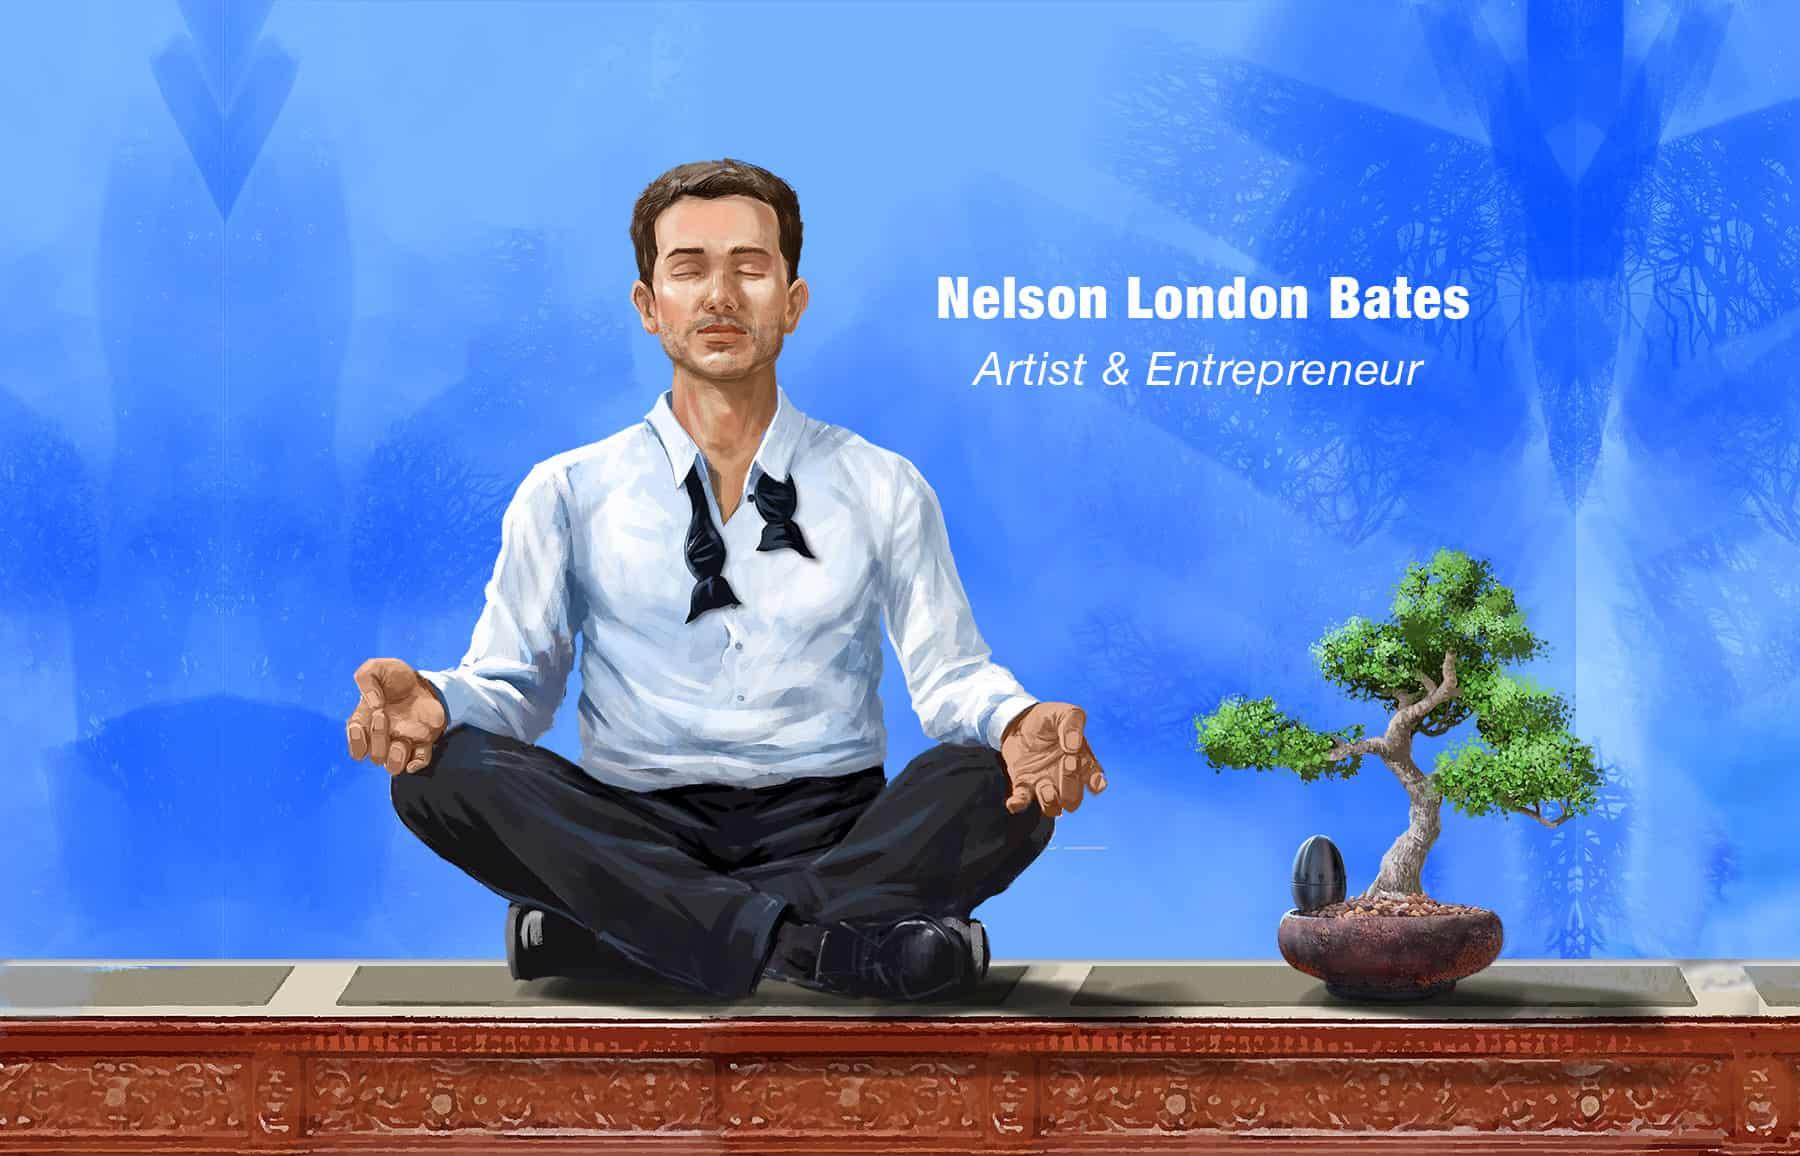 Nelson London Bates